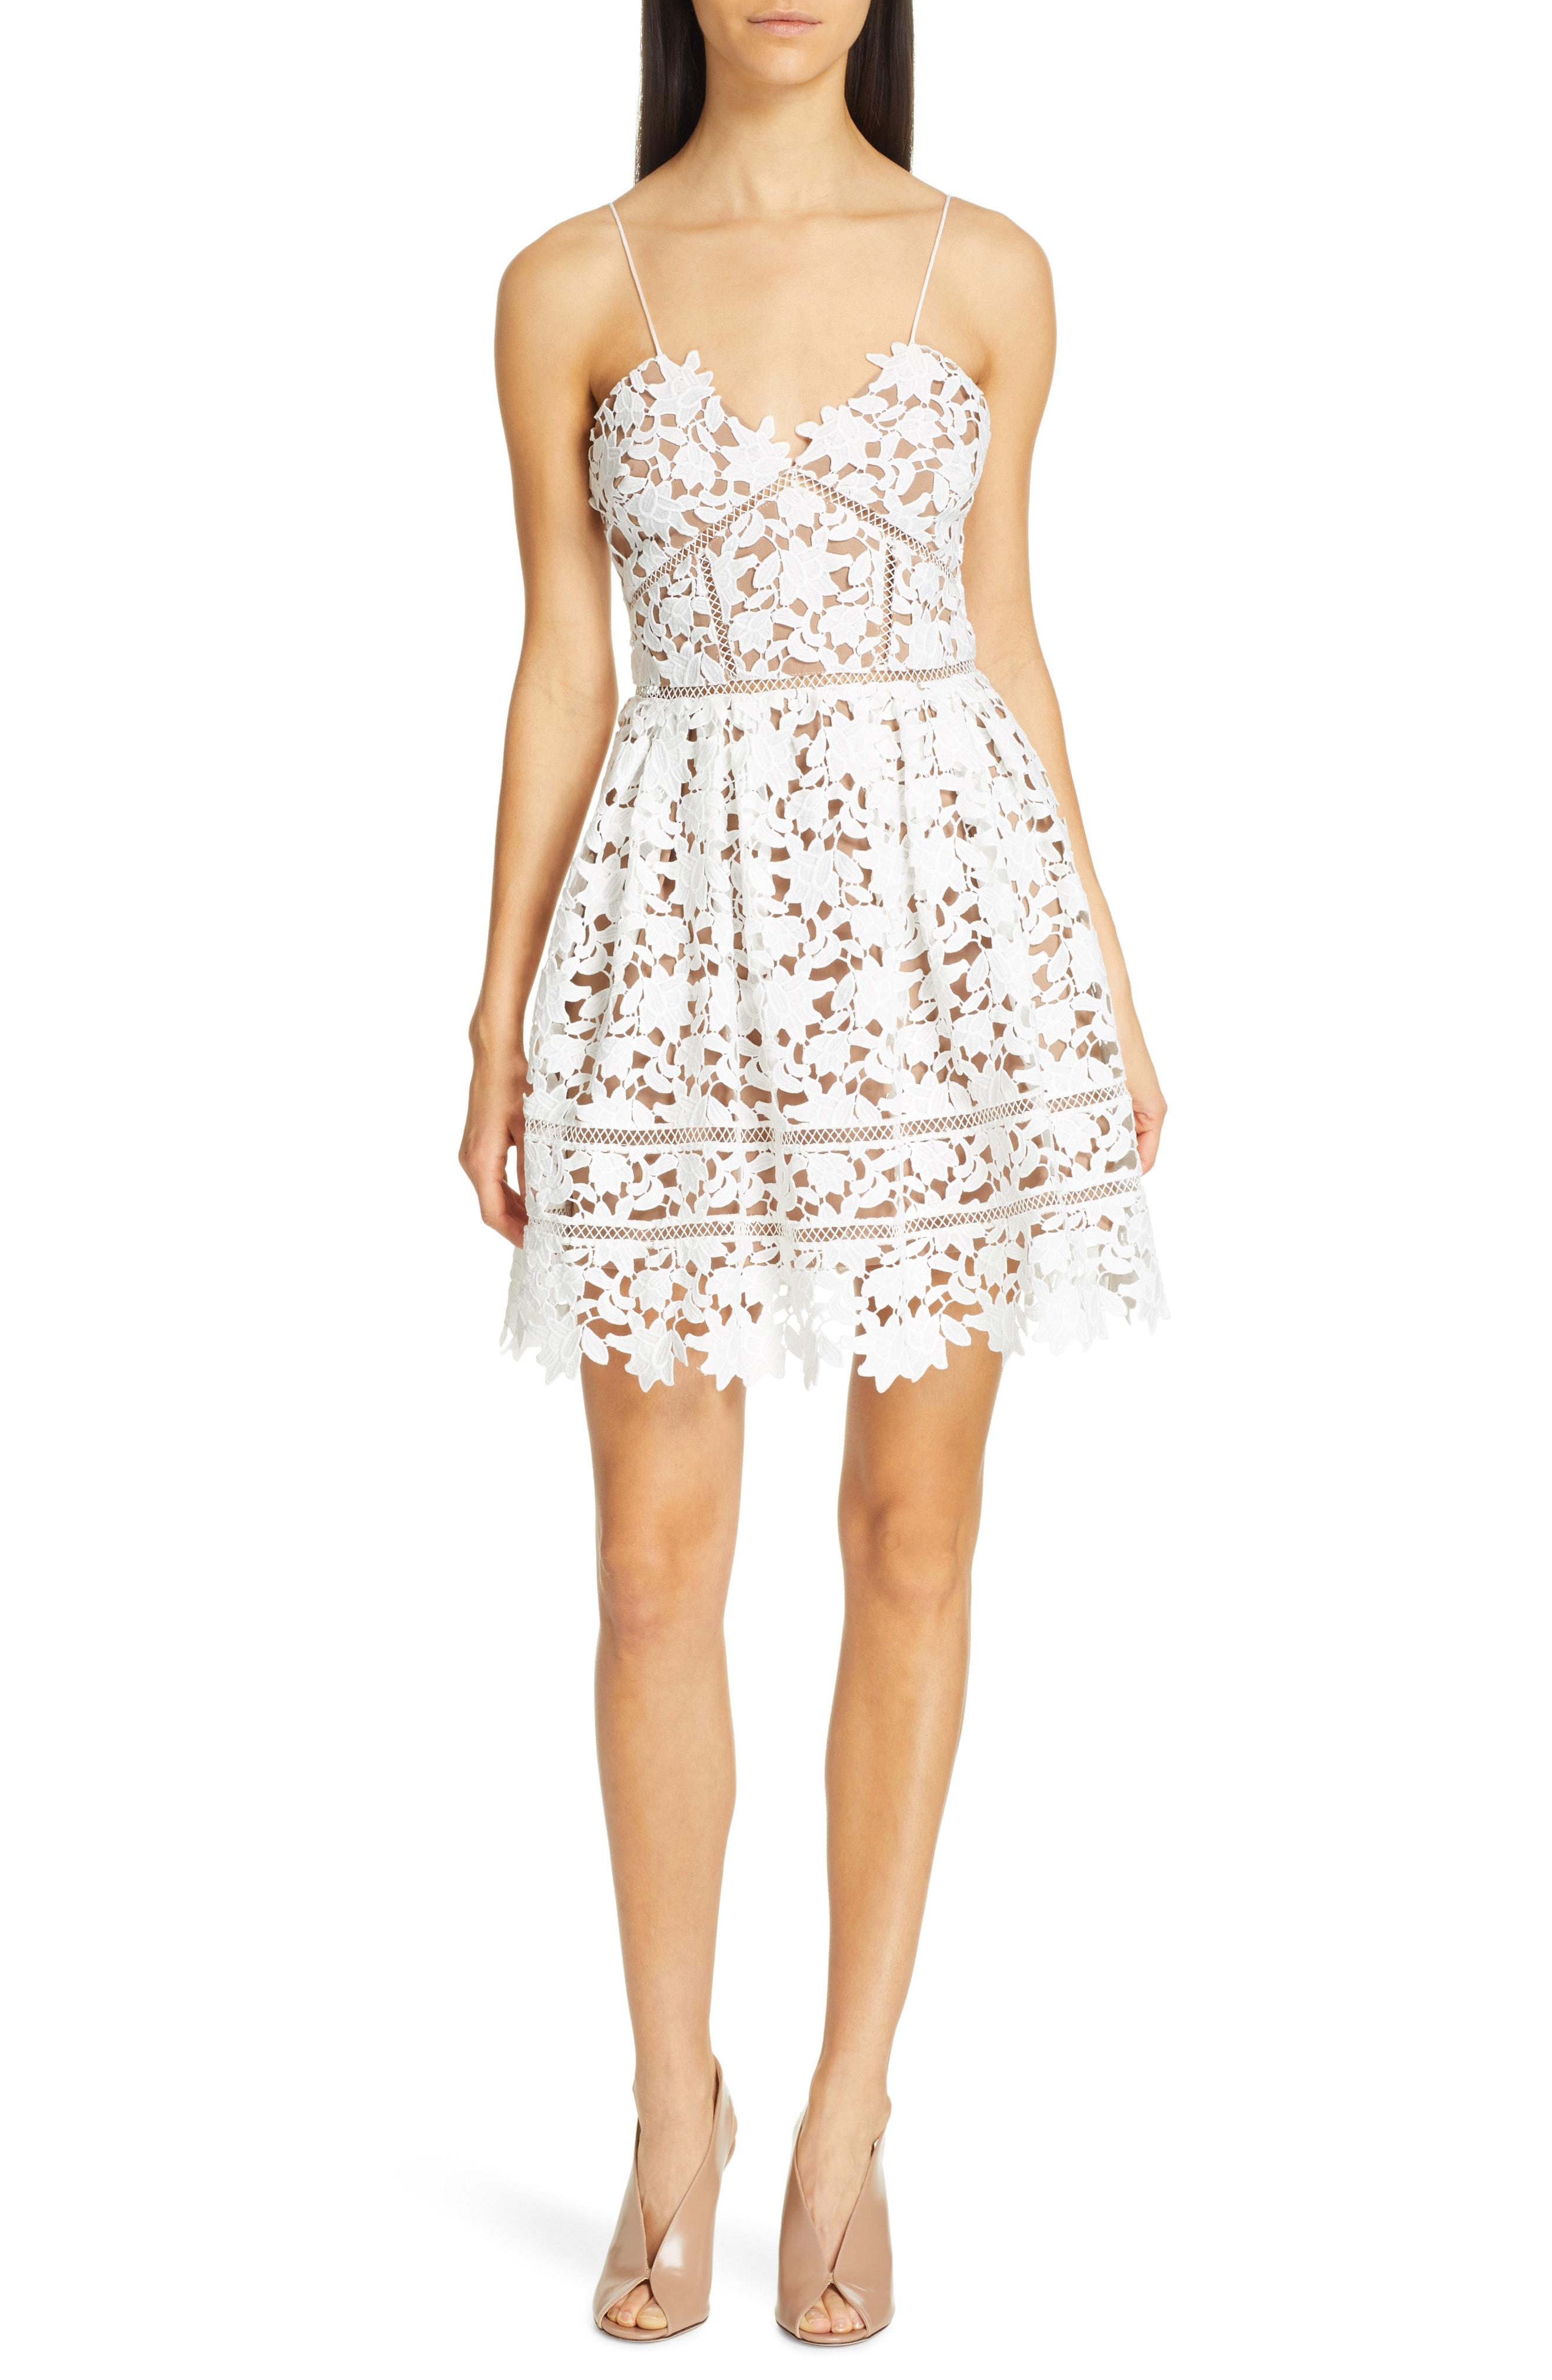 4c0f3e3829d Self-Portrait Azaelea Floral Lace Sleeveless Mini Dress In White ...